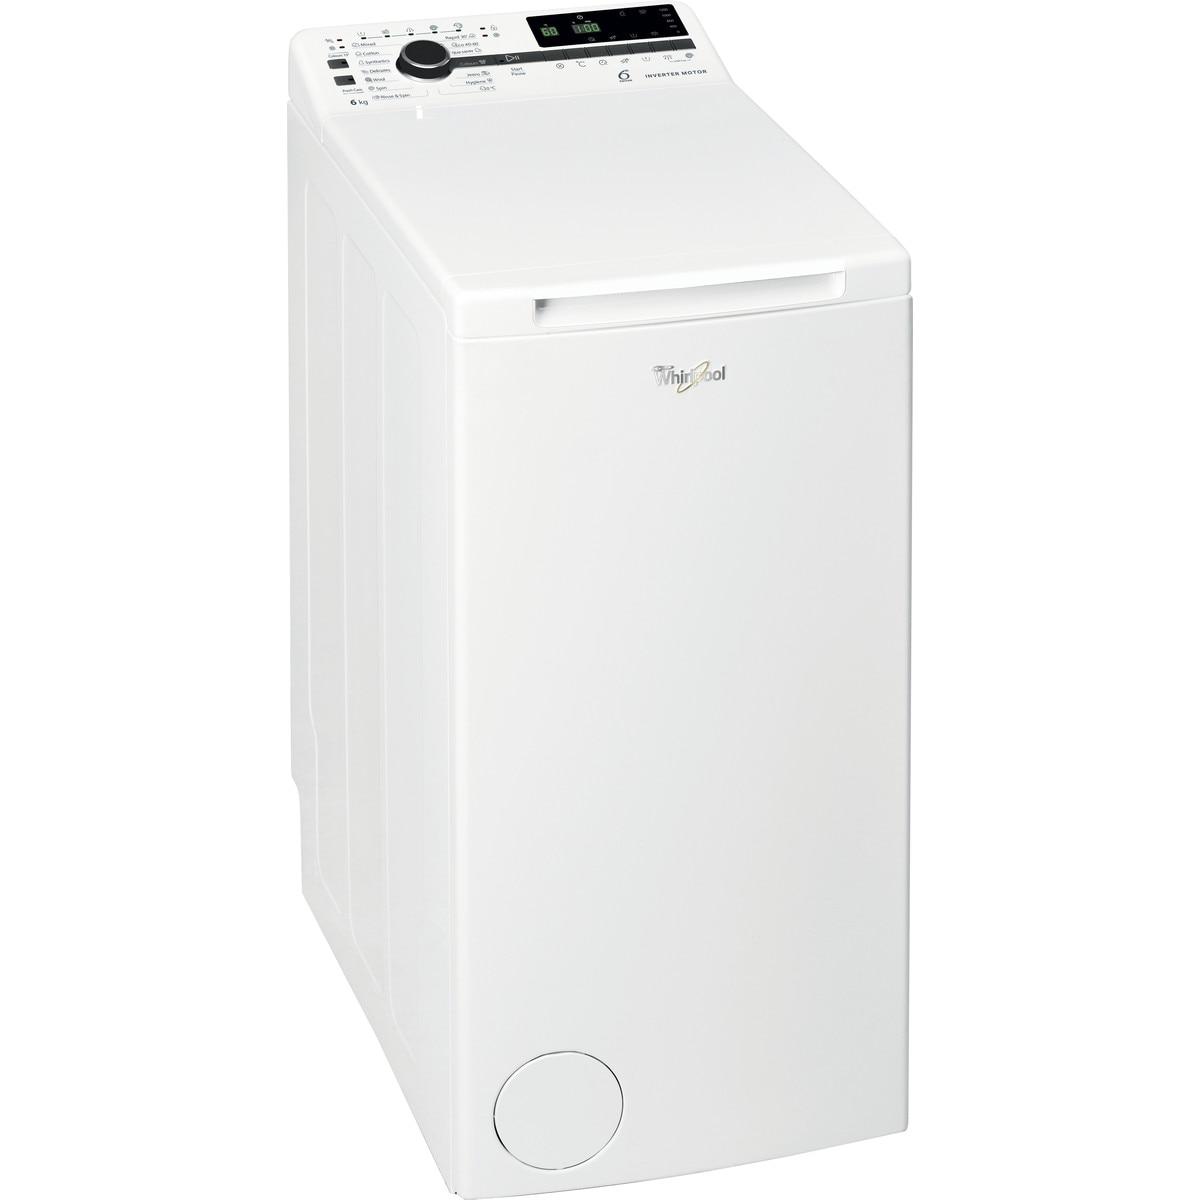 Fotografie Masina de spalat rufe cu incarcare verticala Whirlpool TDLRB6241BSEUN, 6 kg, 1200 rpm, Clasa C, Tehnologia al-6lea Simt, Motor Inverter, Display digital, Alb